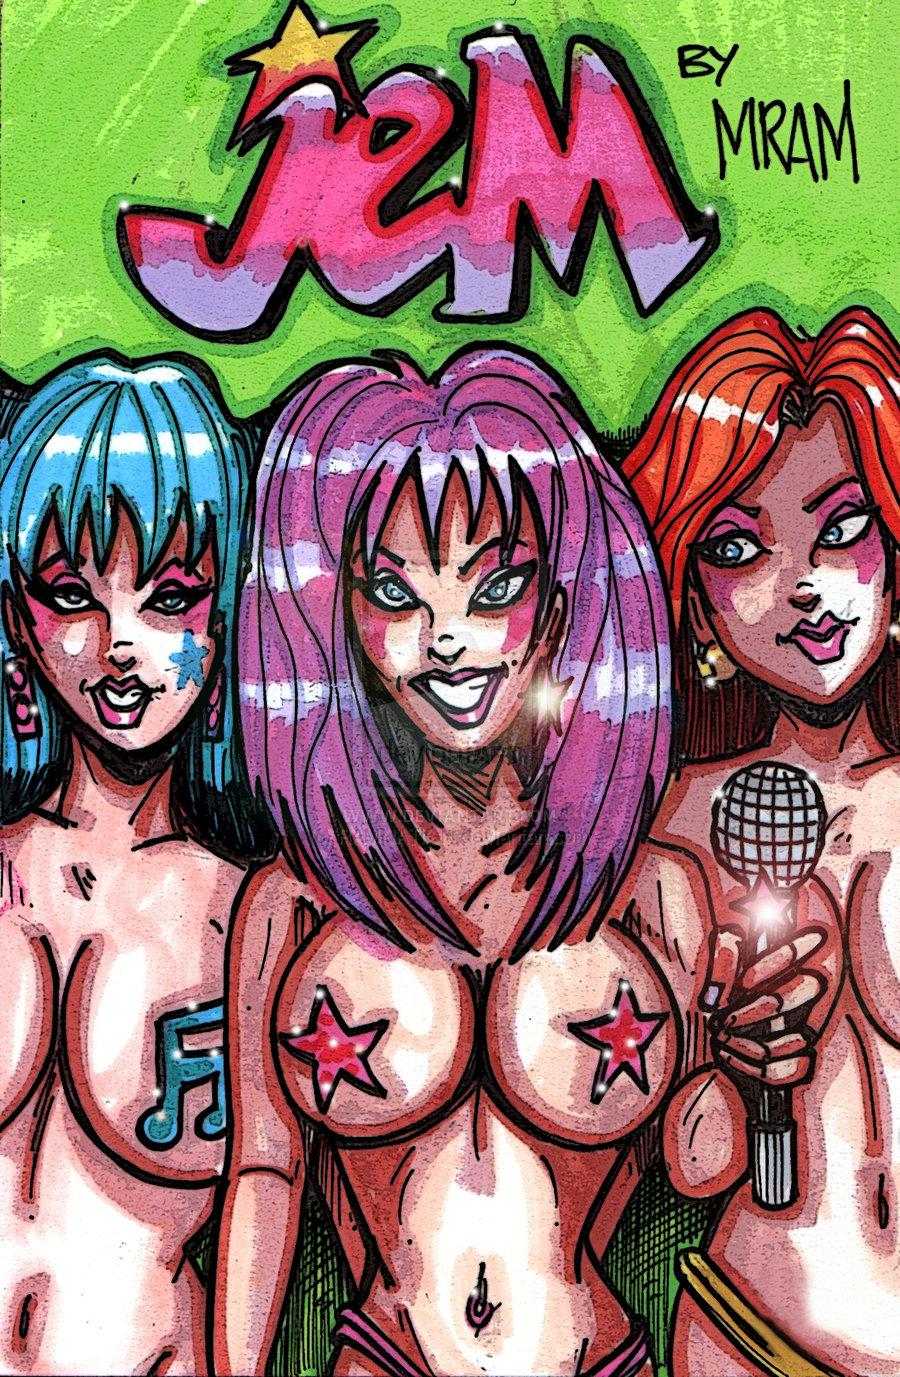 holograms and jem the danse Prison school vice president nude